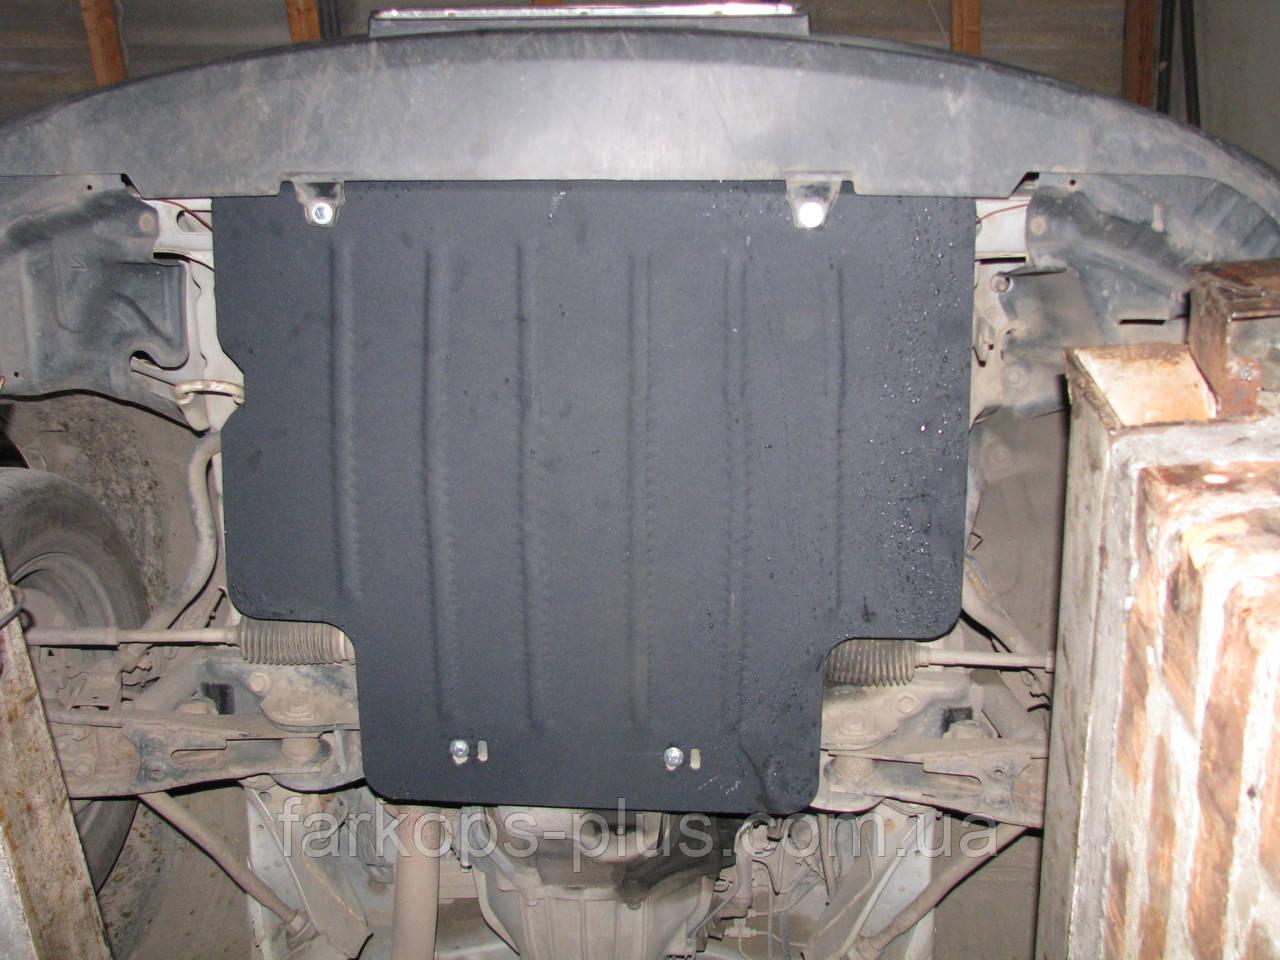 Захист двигуна - механіка Toyota Hiace XH10 (1995-2012) 2.5, 2.4 D